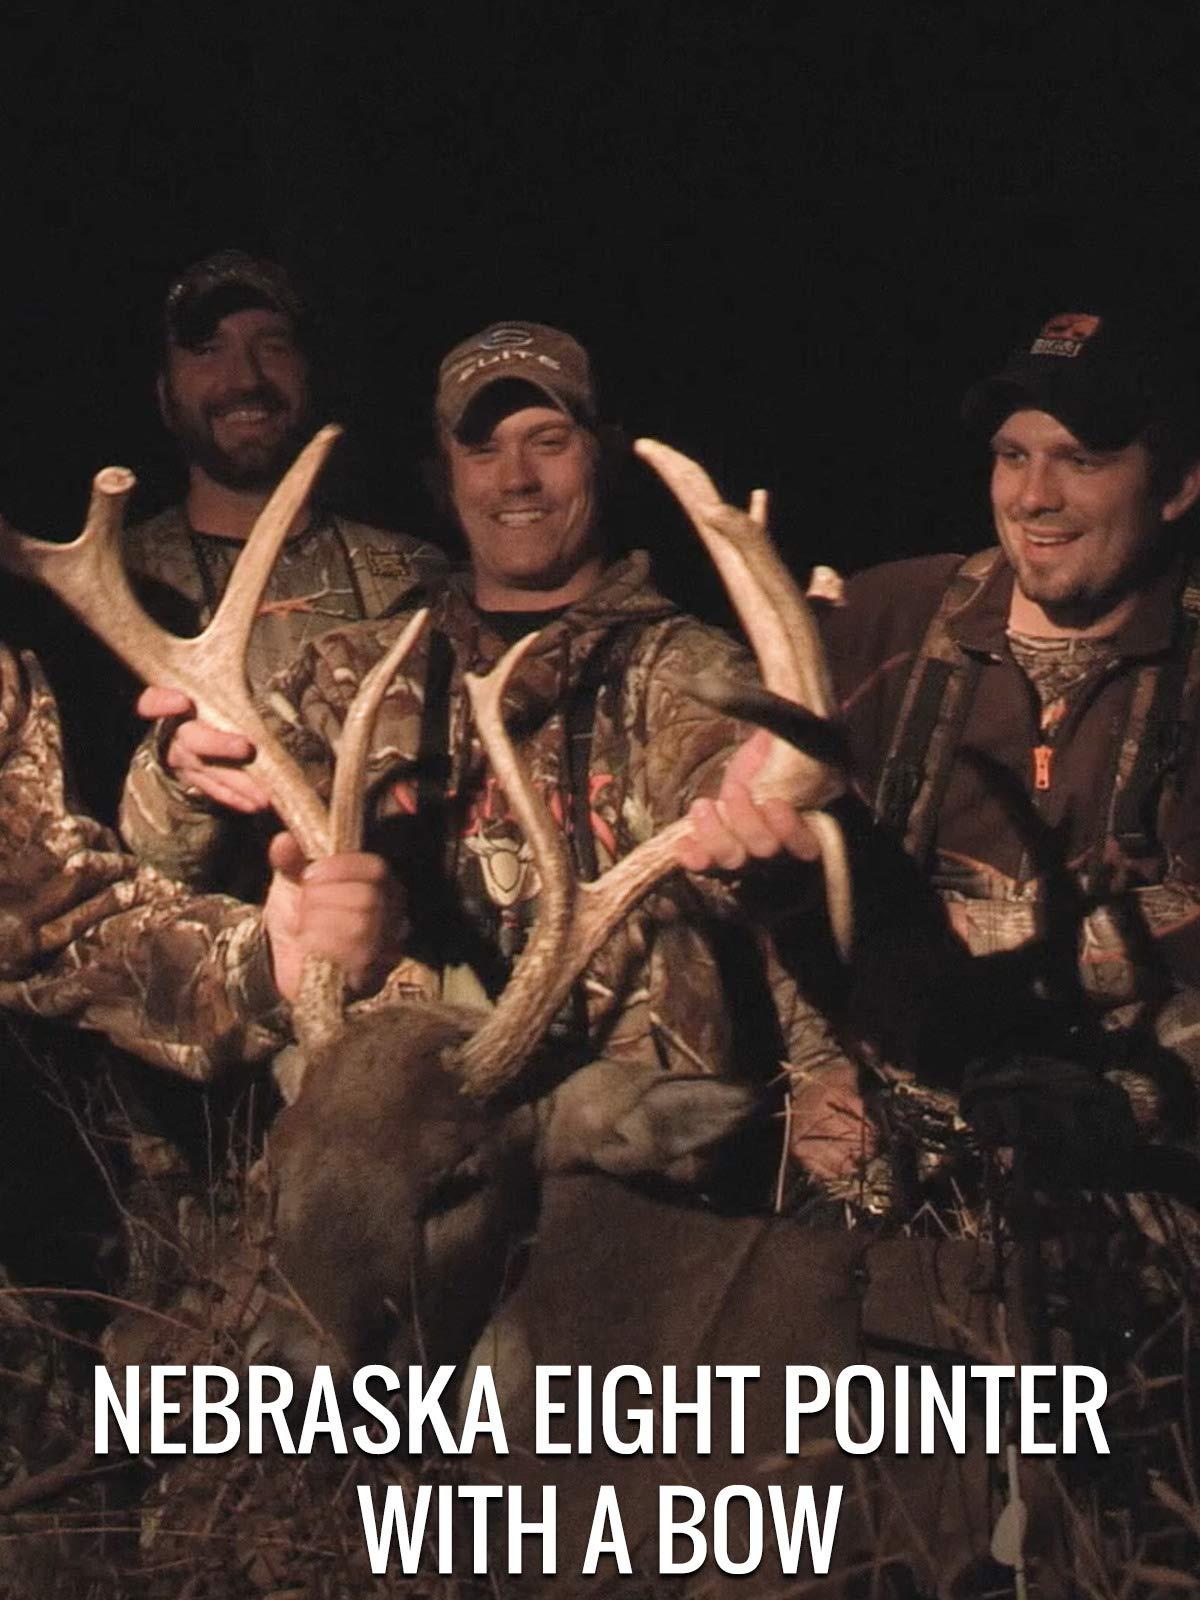 Nebraska Eight Pointer With A Bow